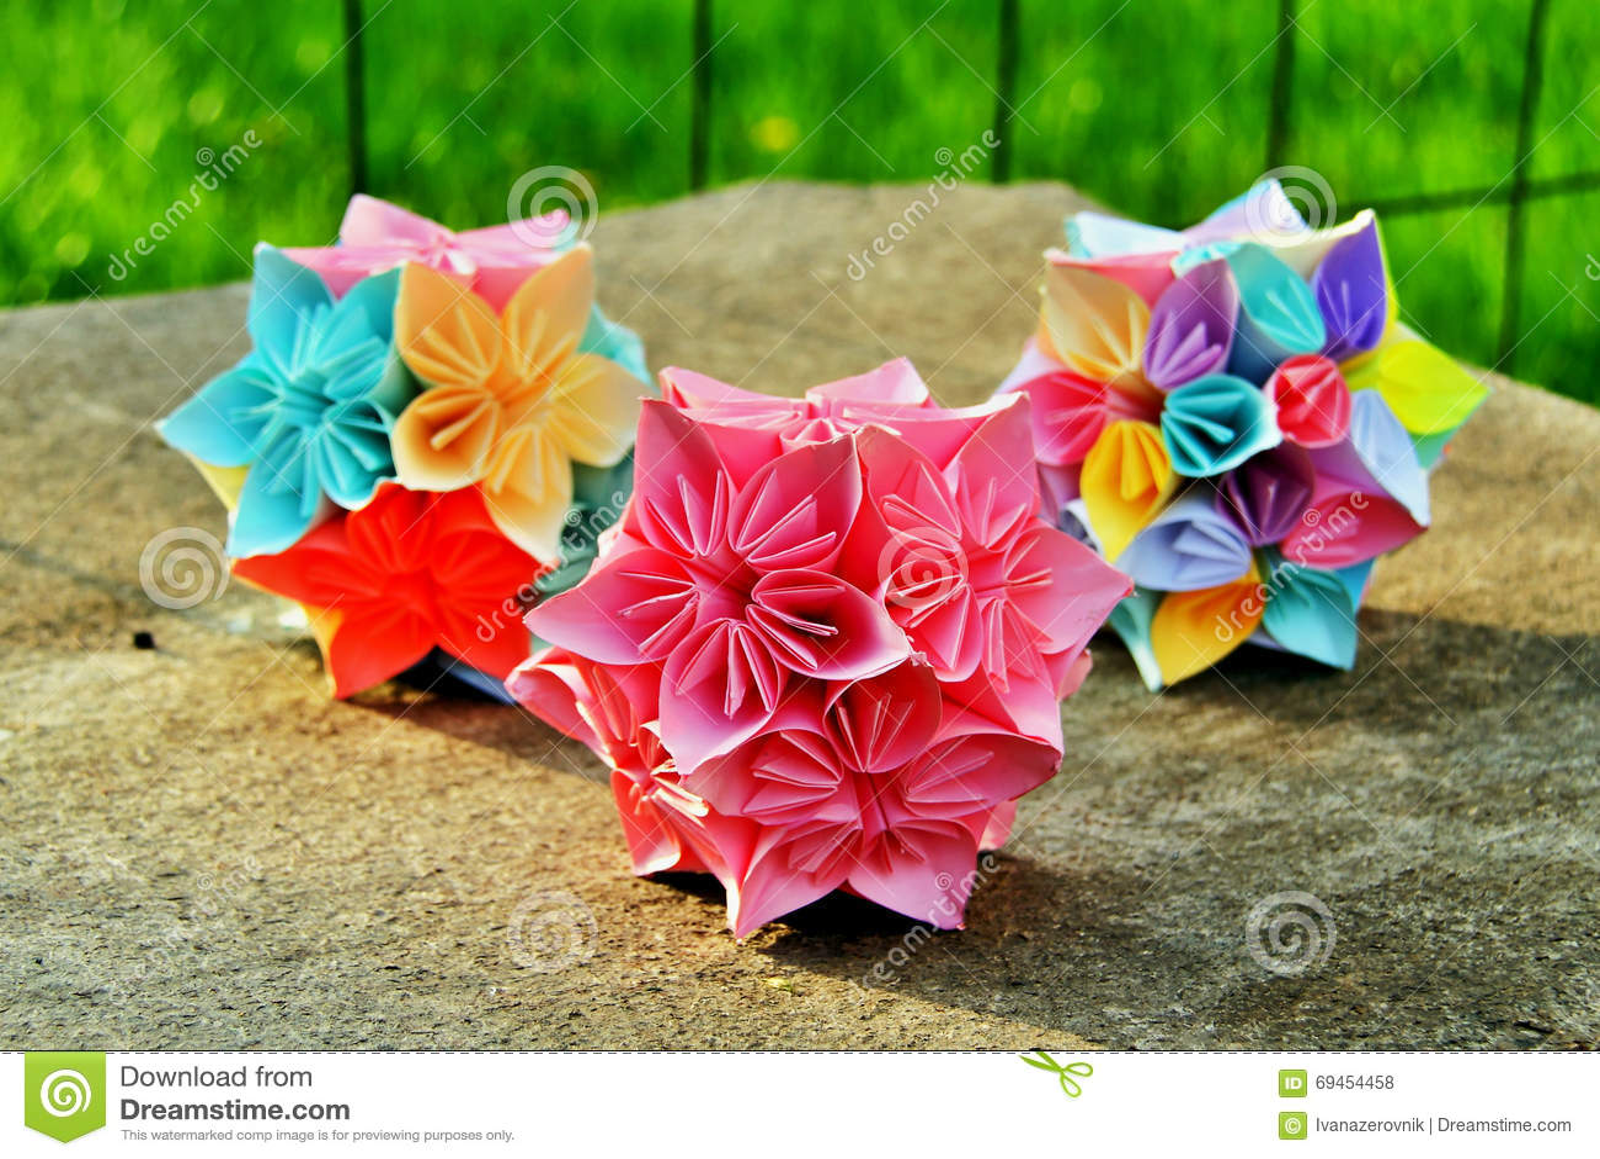 Origami Kusudama Flower Balls Stock Photo Image Of Culture Balls